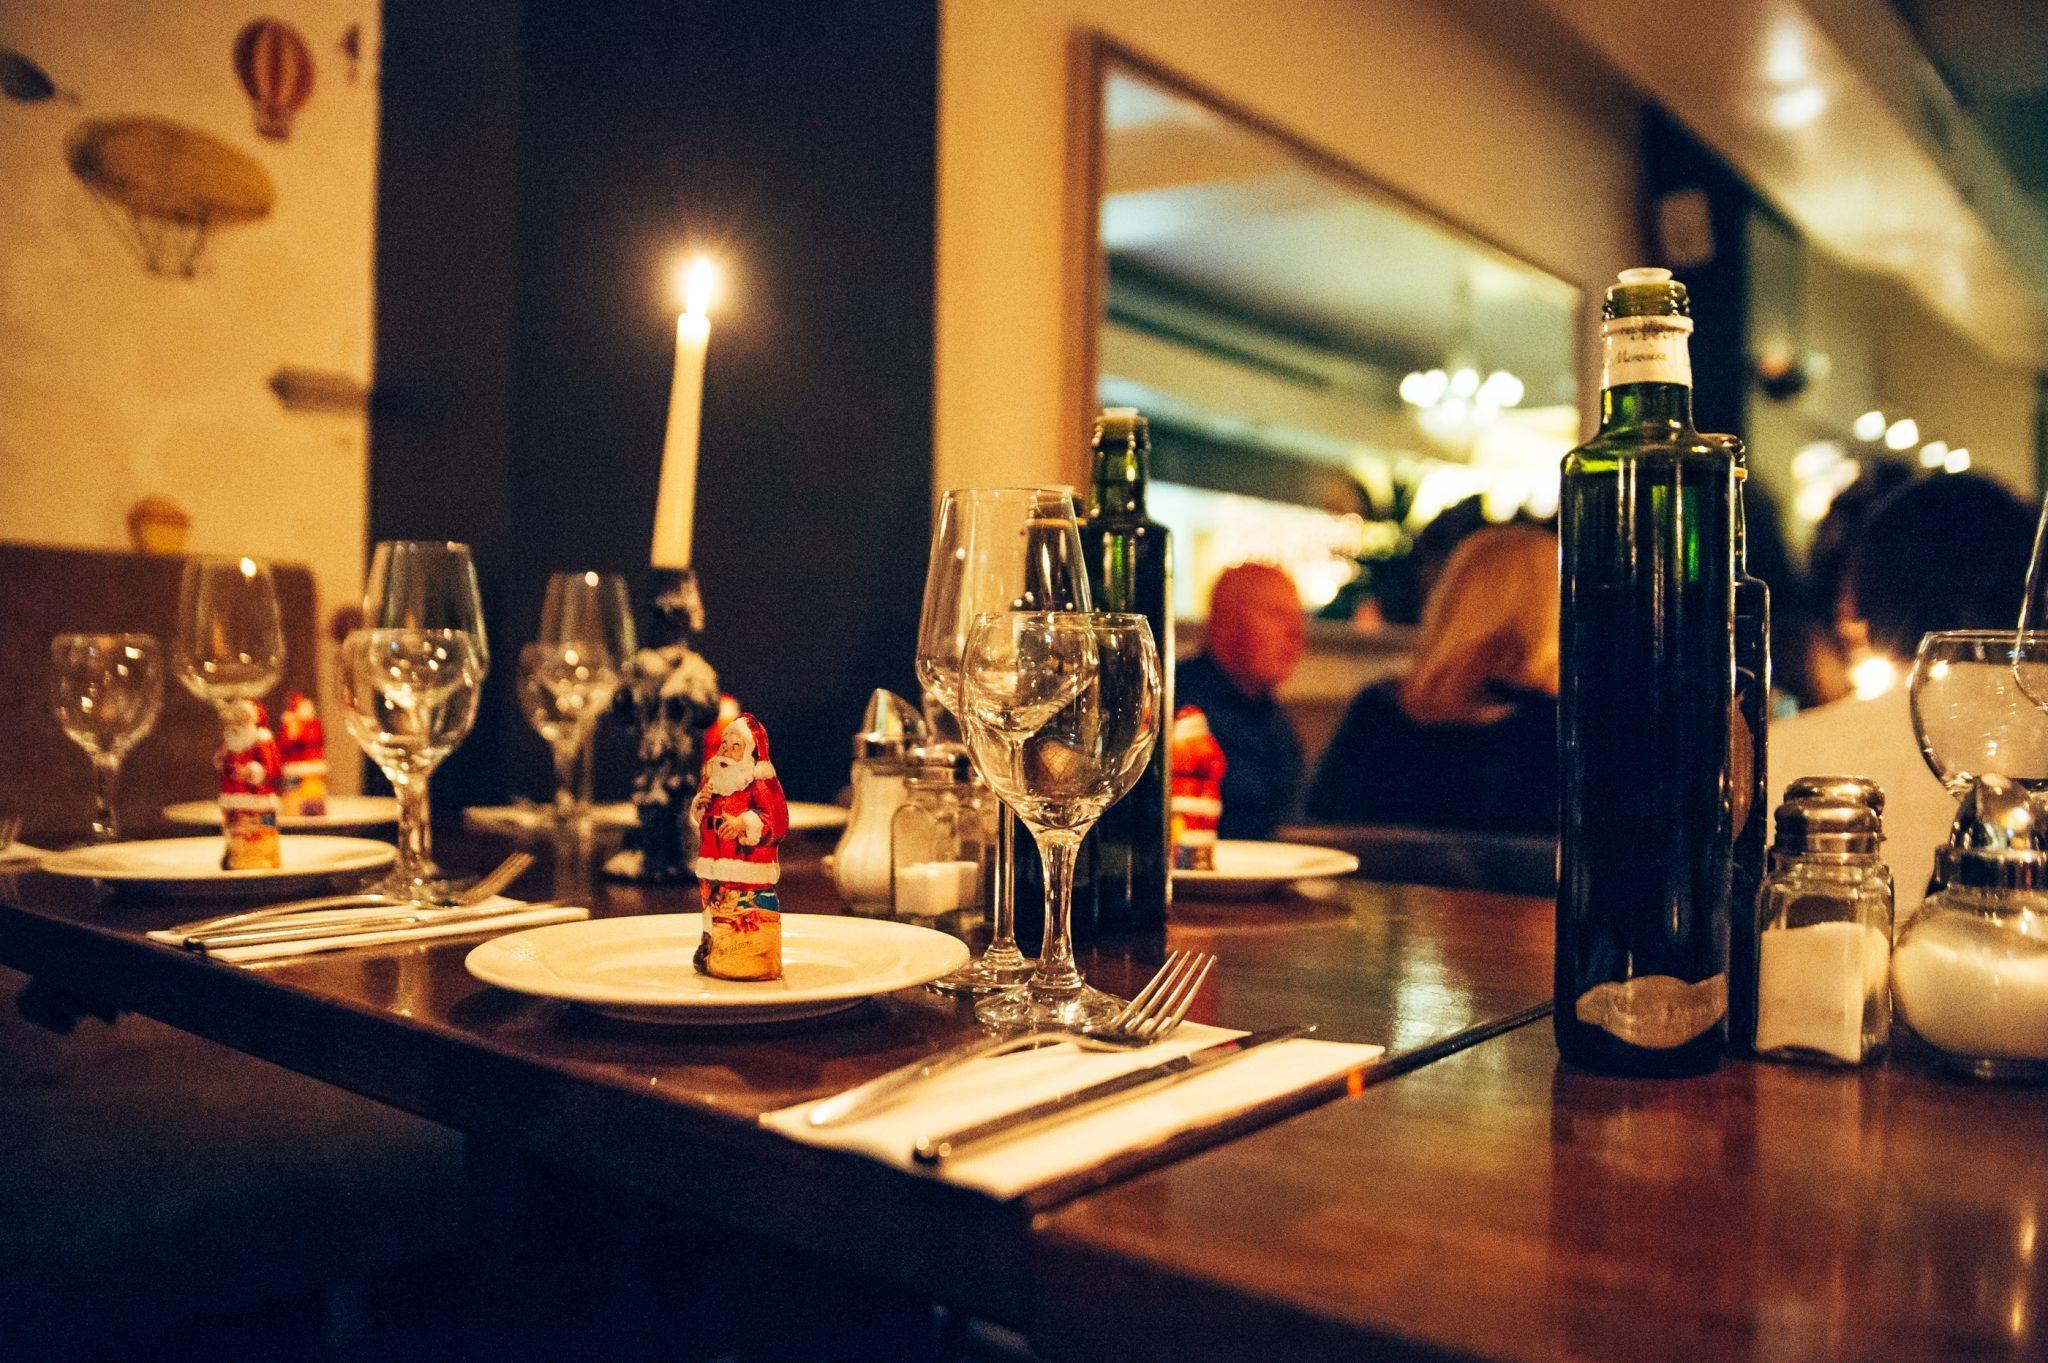 basil 39 s das szene restaurant in d sseldorf im neuen look alldesign. Black Bedroom Furniture Sets. Home Design Ideas